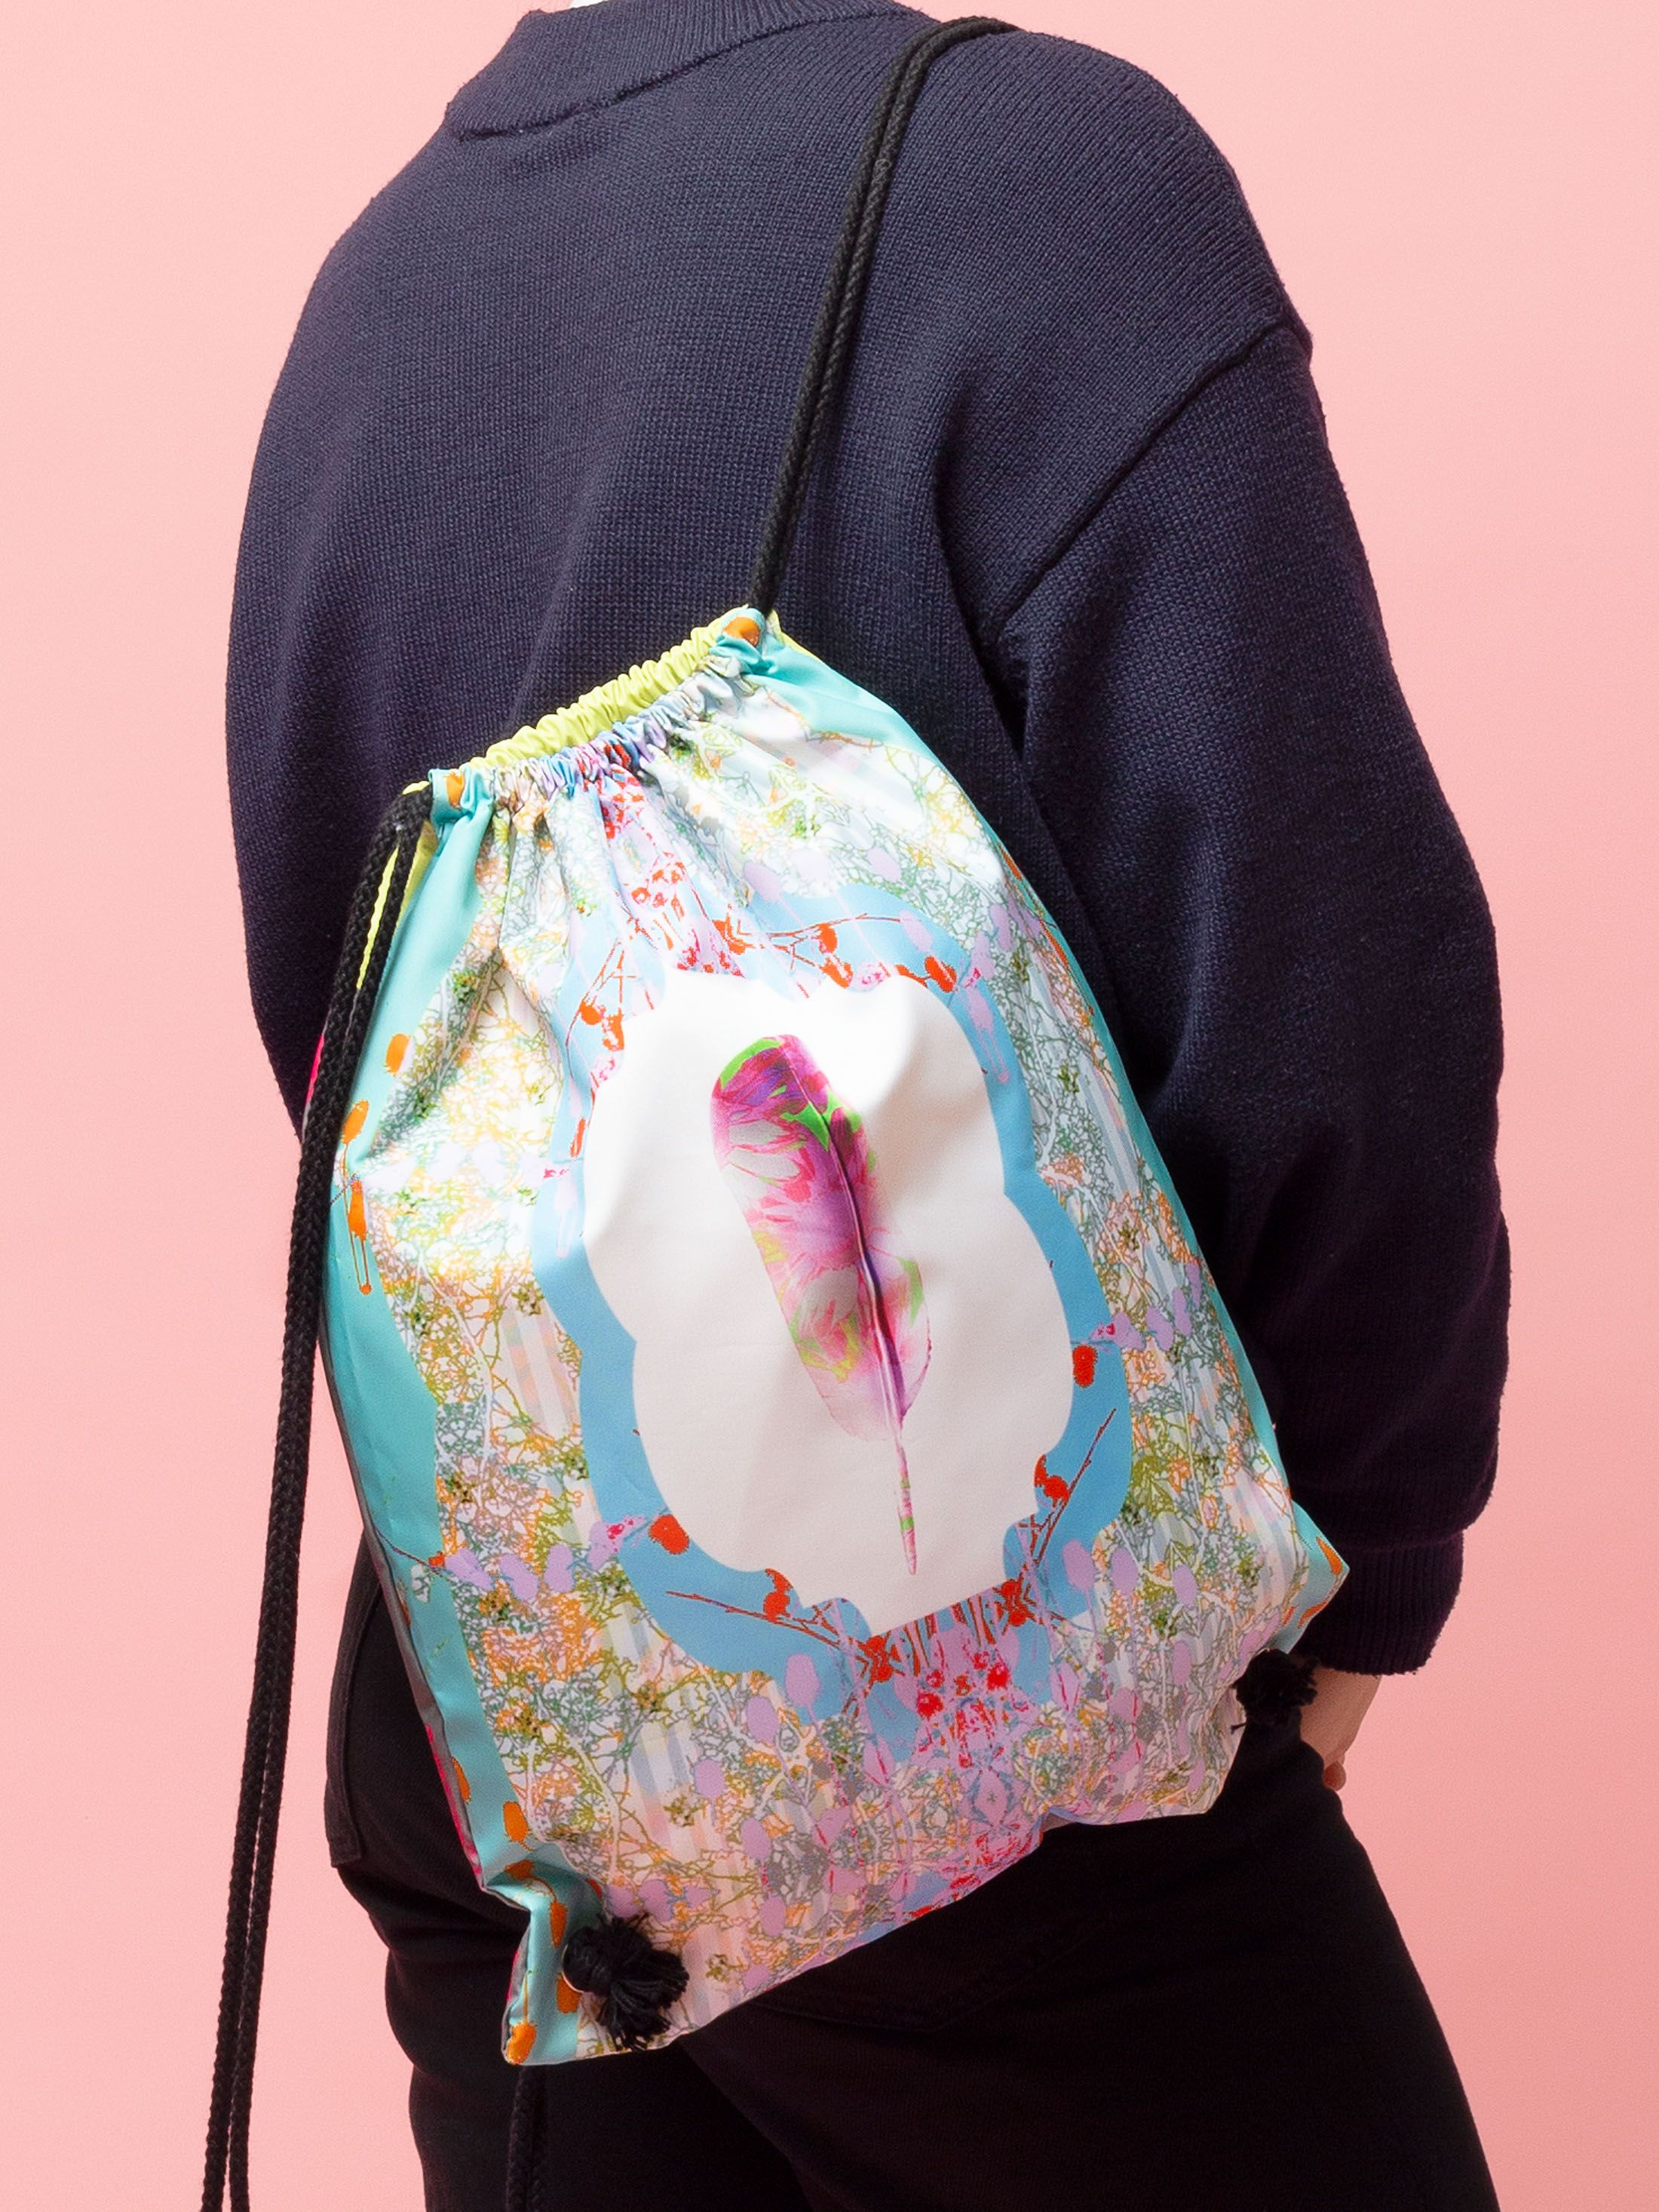 custom drawstring backpack with original illustration